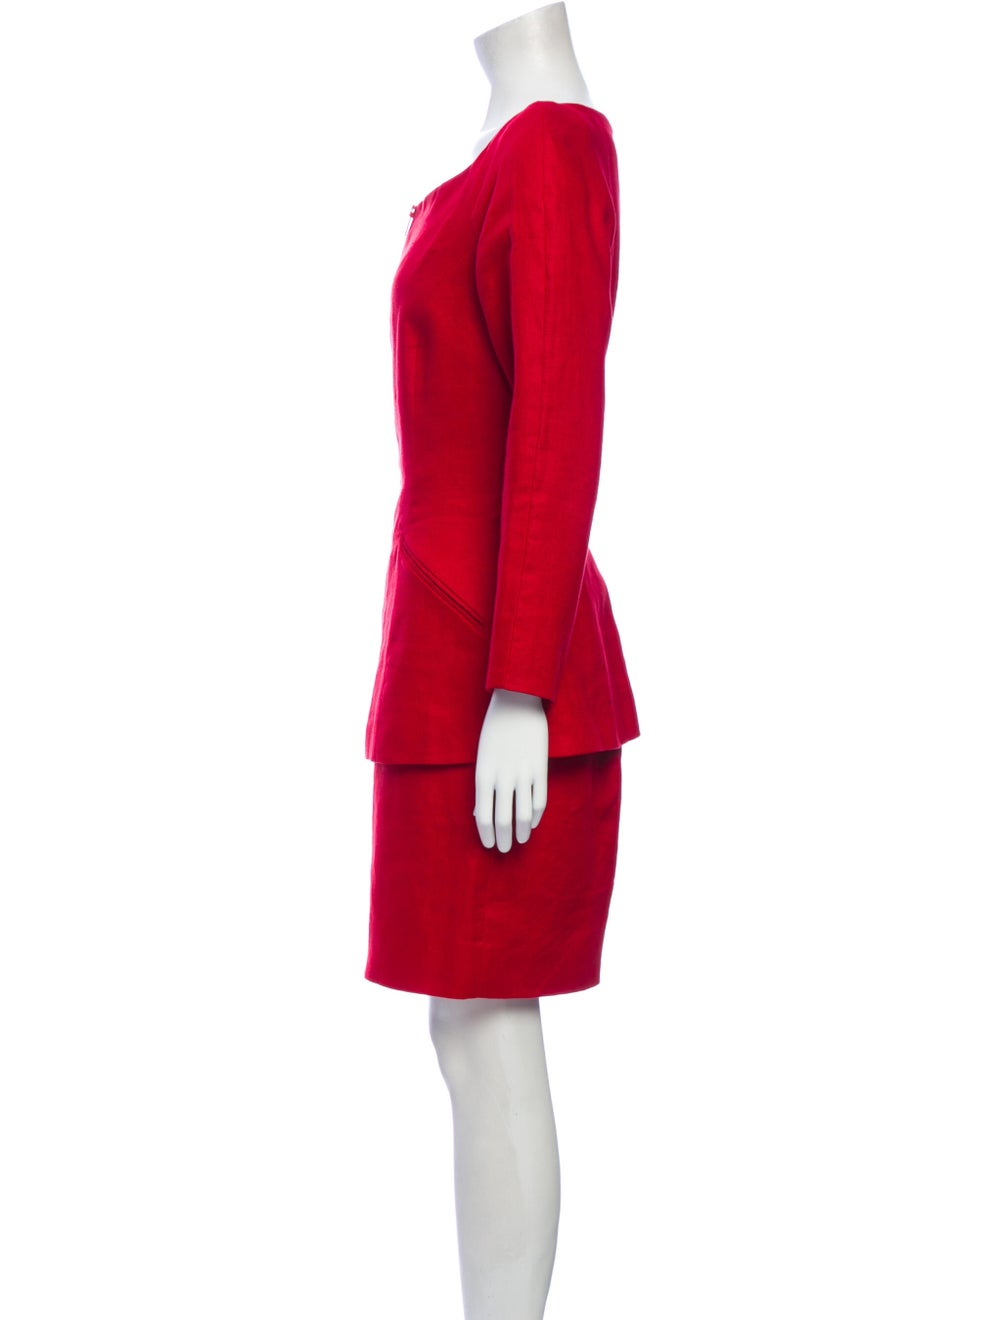 Michael Kors Linen Skirt Suit Red - image 2